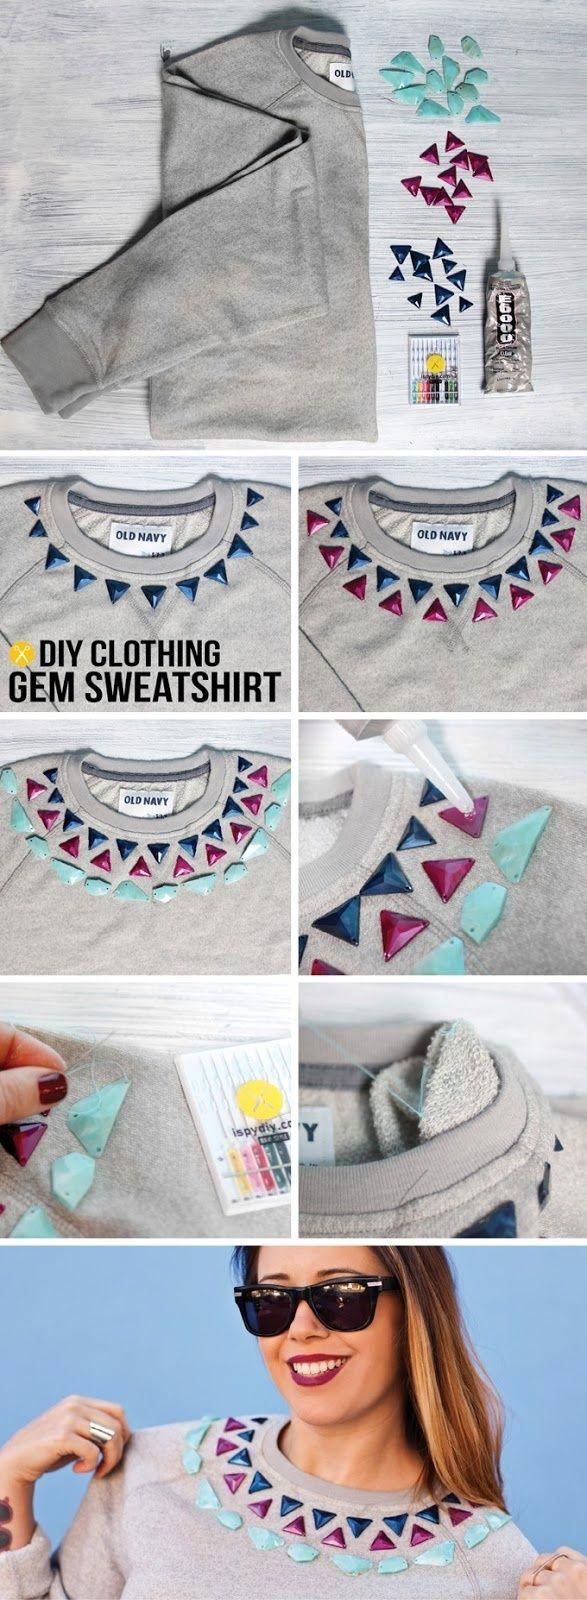 Decorar ropa